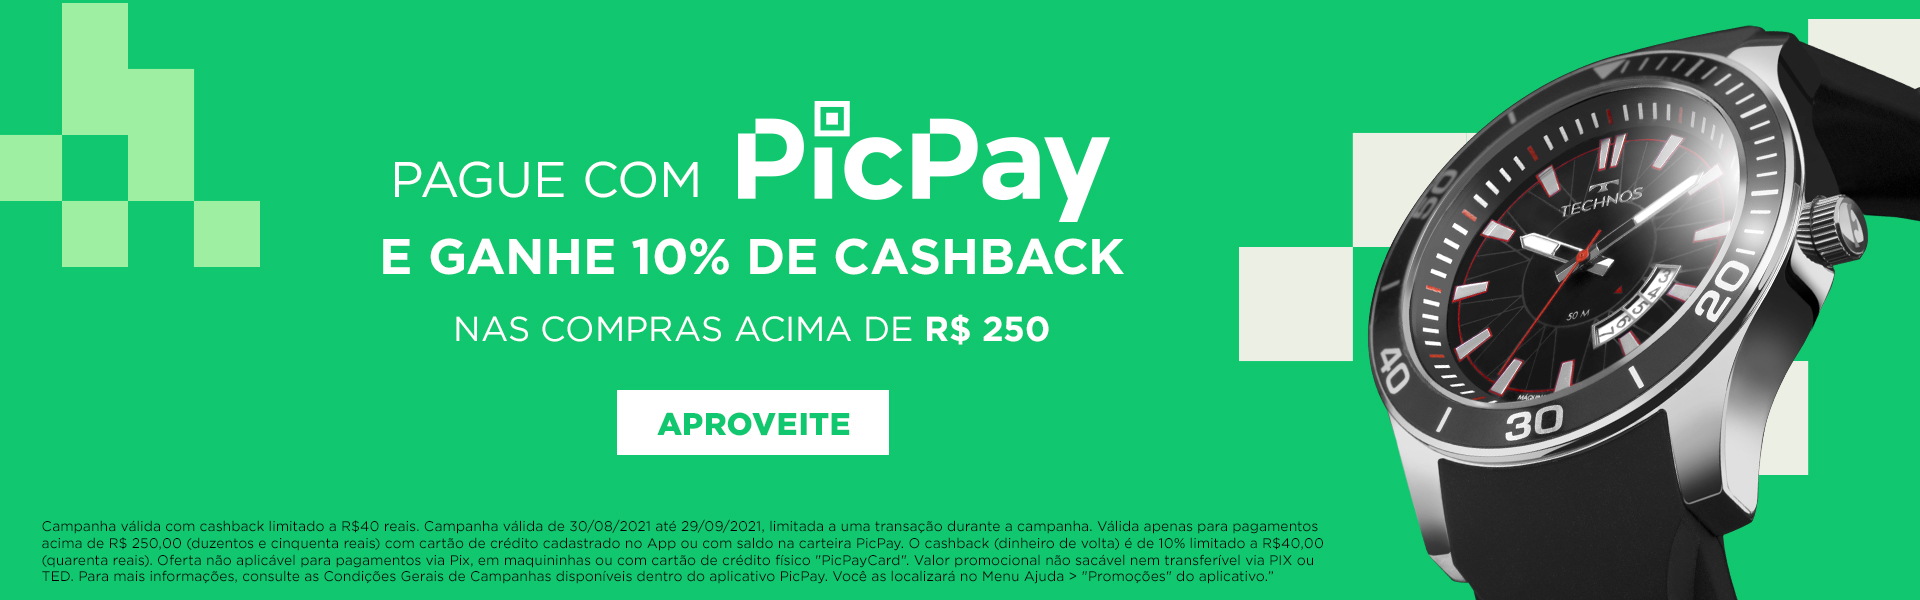 PicPay2